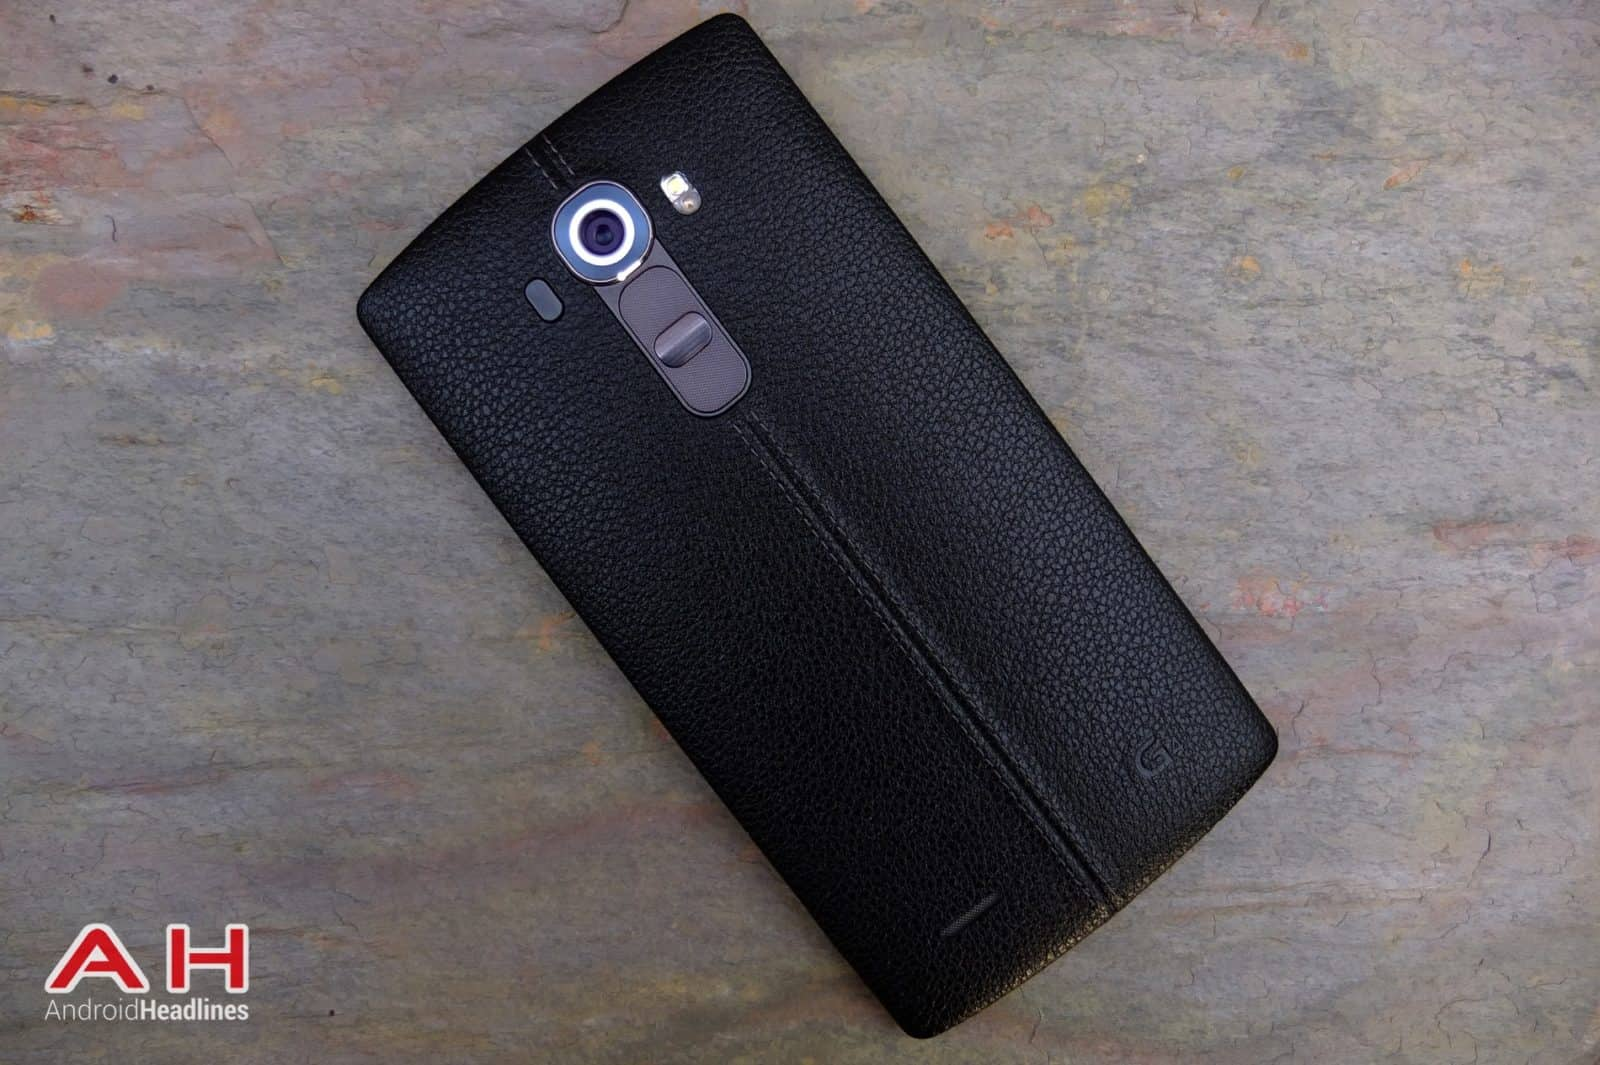 LG G4 BlackLeather TD AH 12